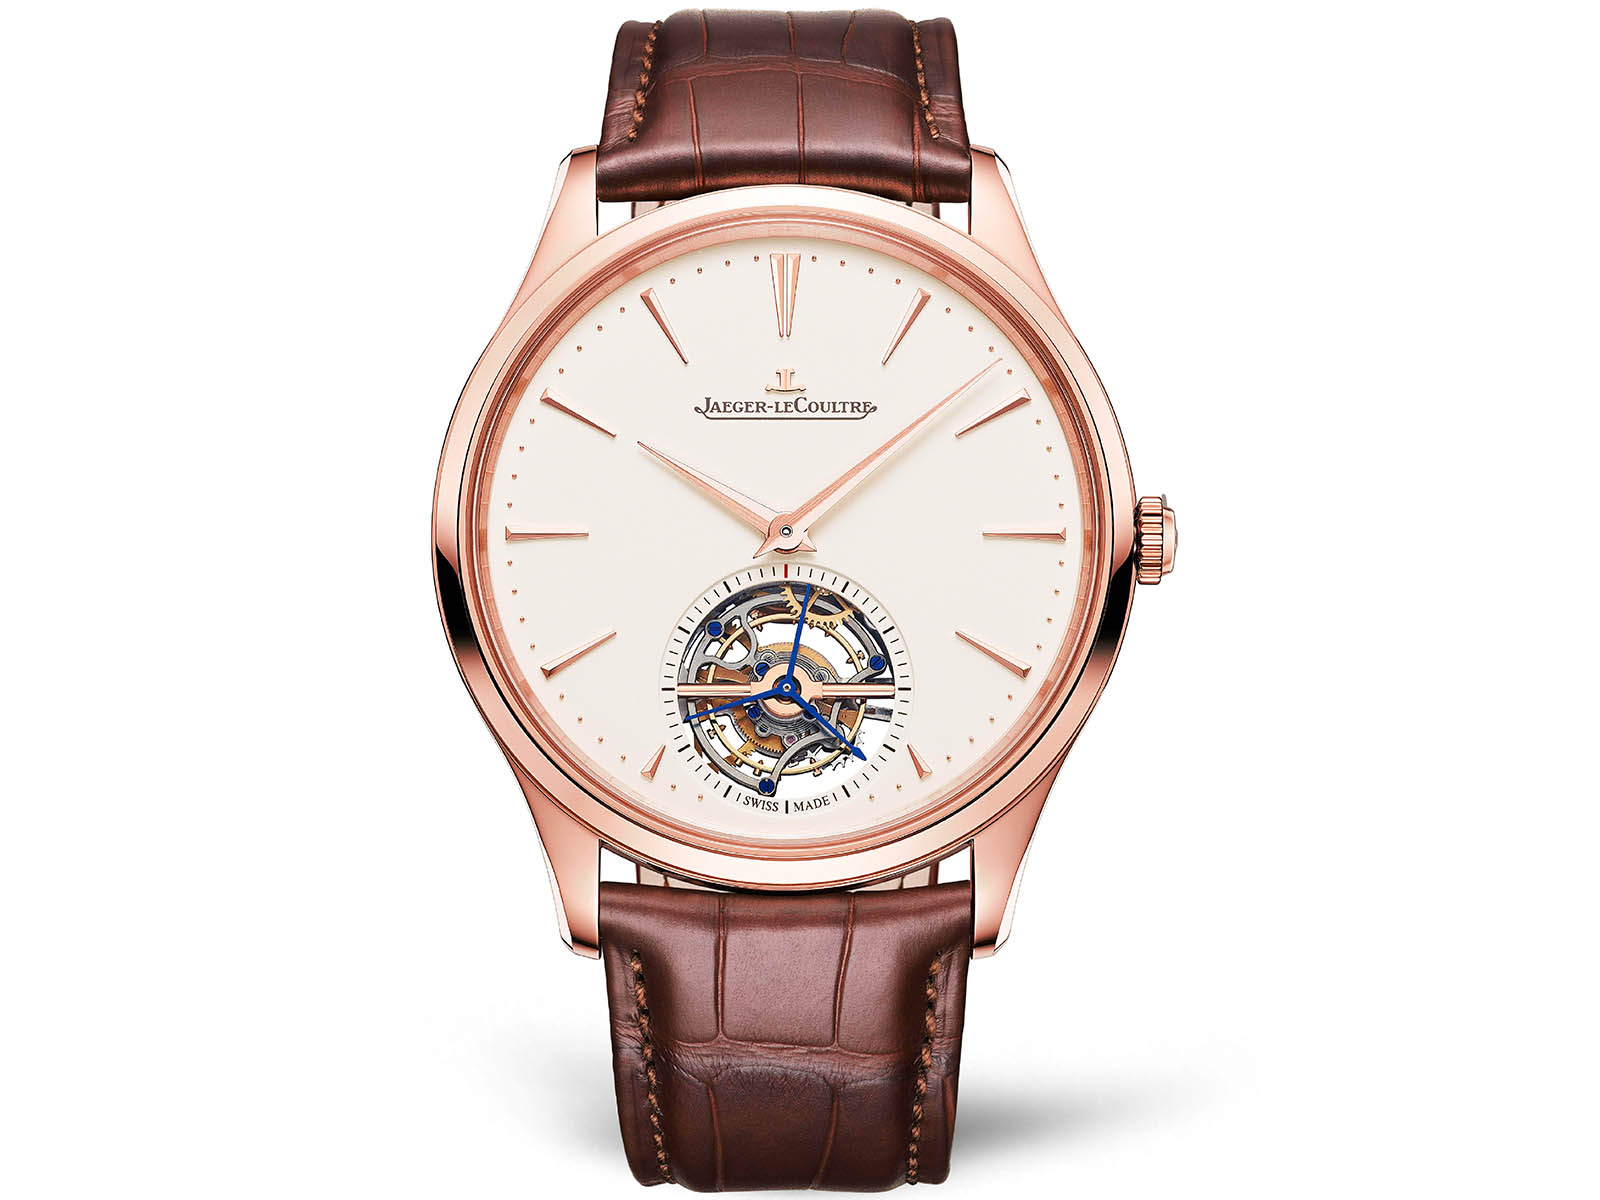 q1682410-jaeger-lecoultre-master-ultra-thin-tourbillon-18k-pink-gold-3.jpg